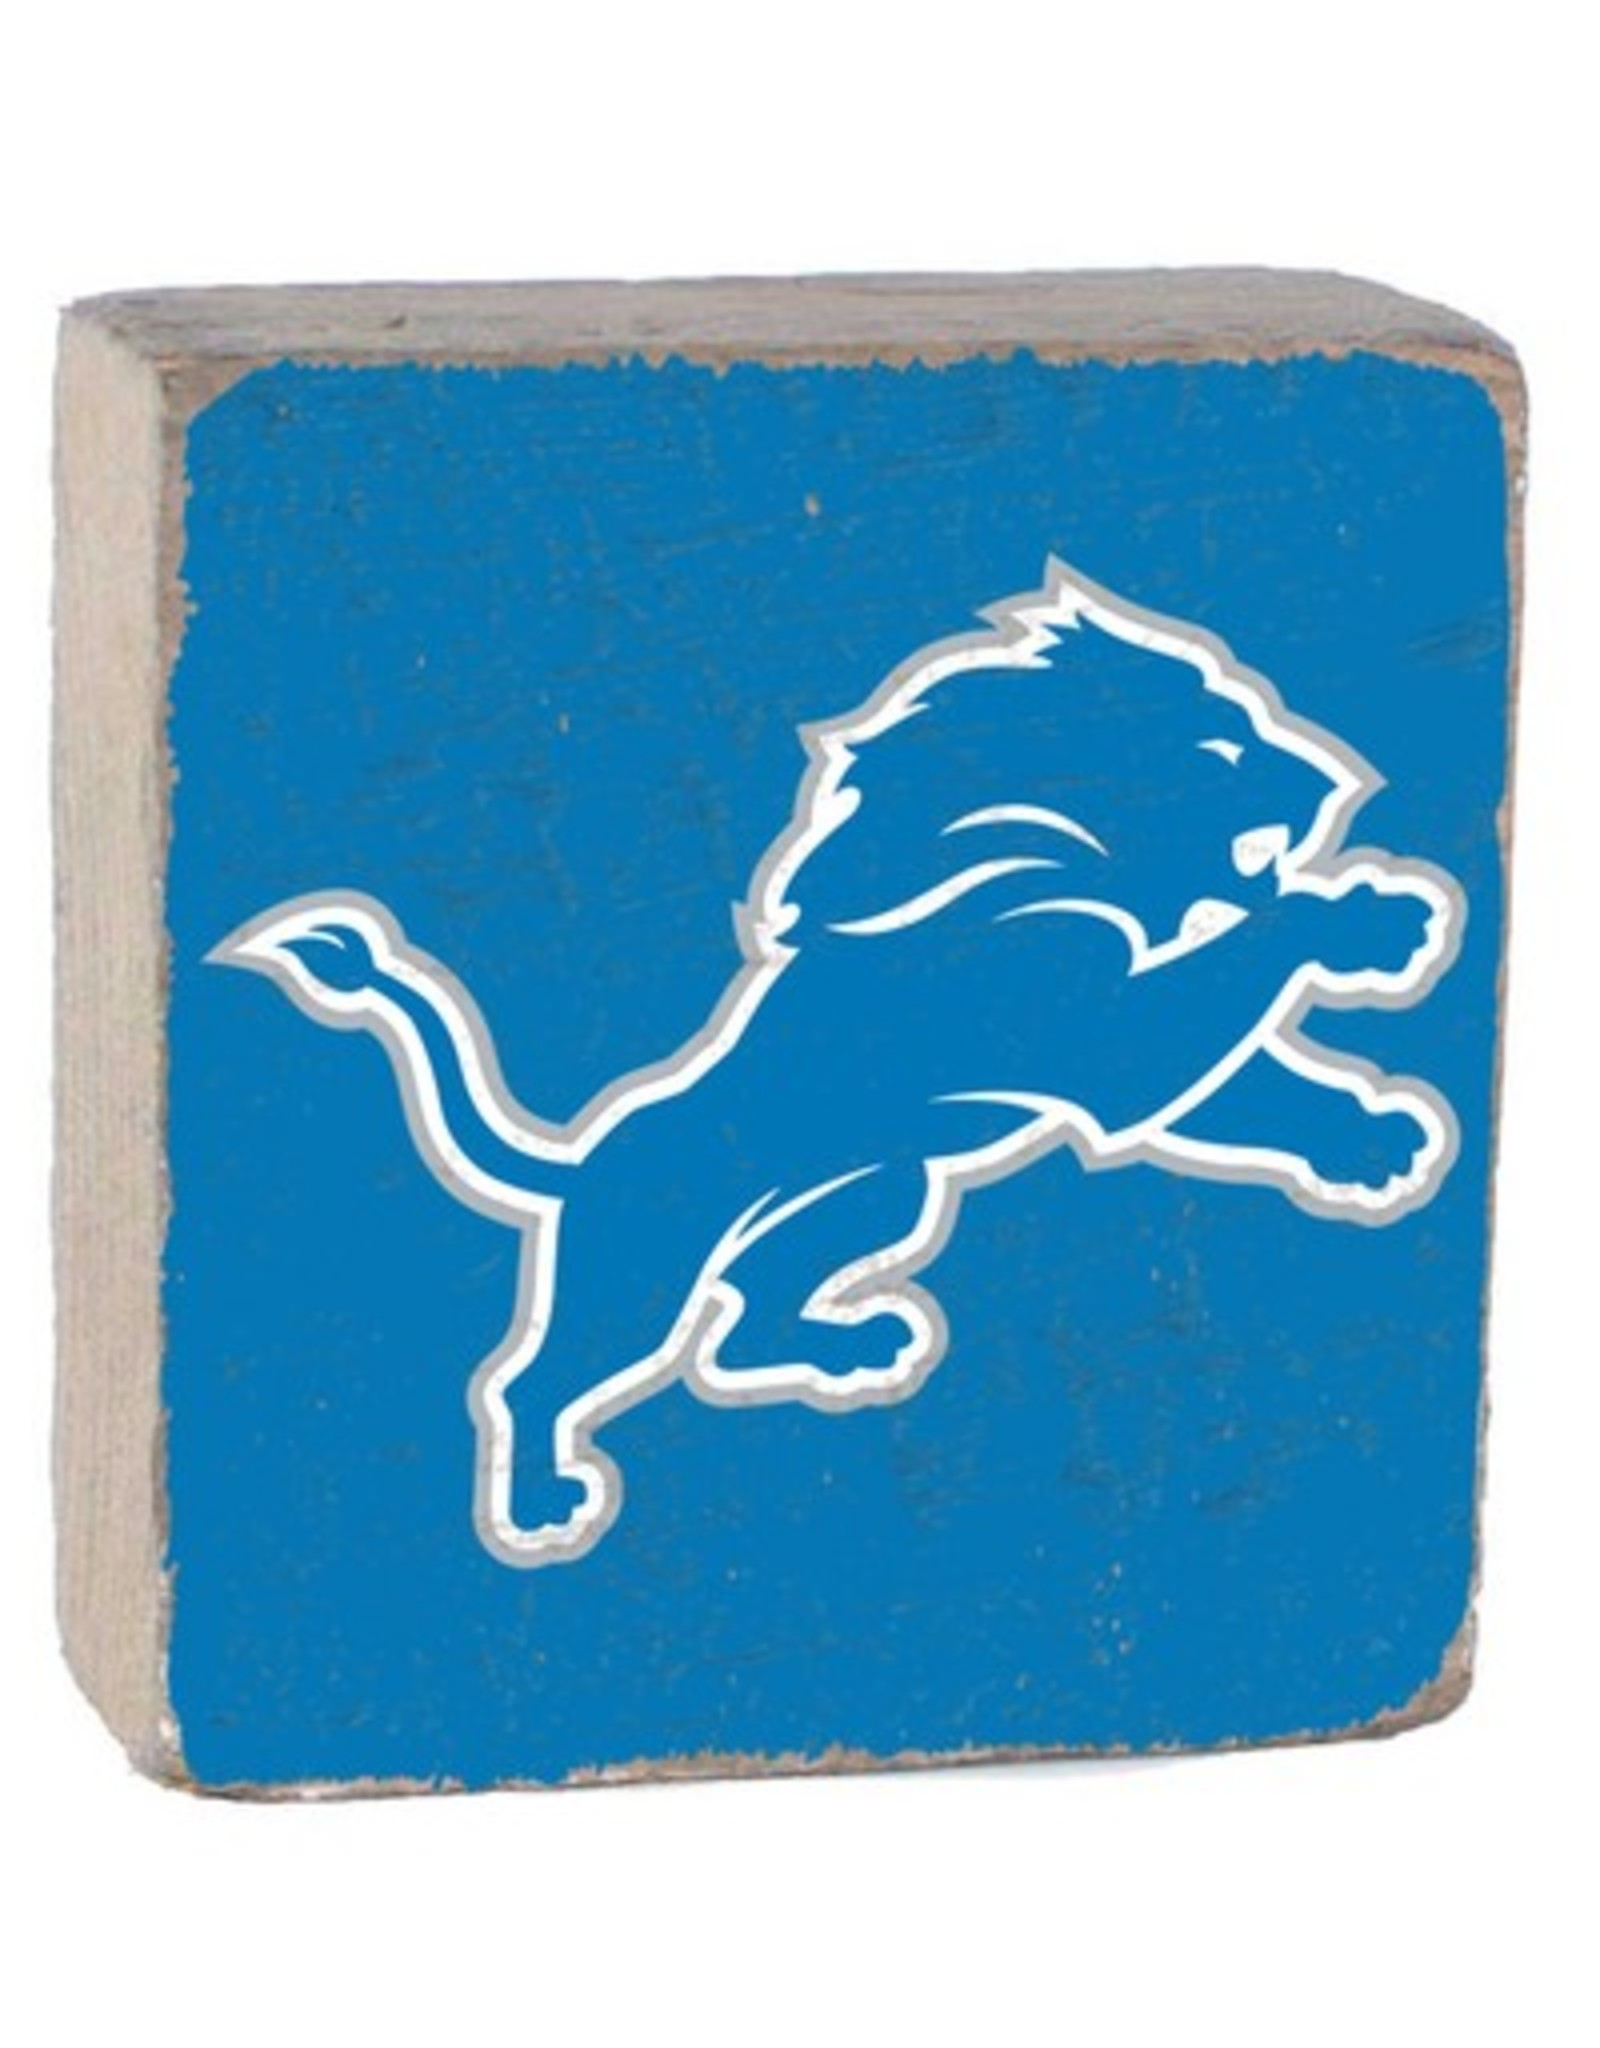 RUSTIC MARLIN Detriot Lions Rustic Wood Team Block